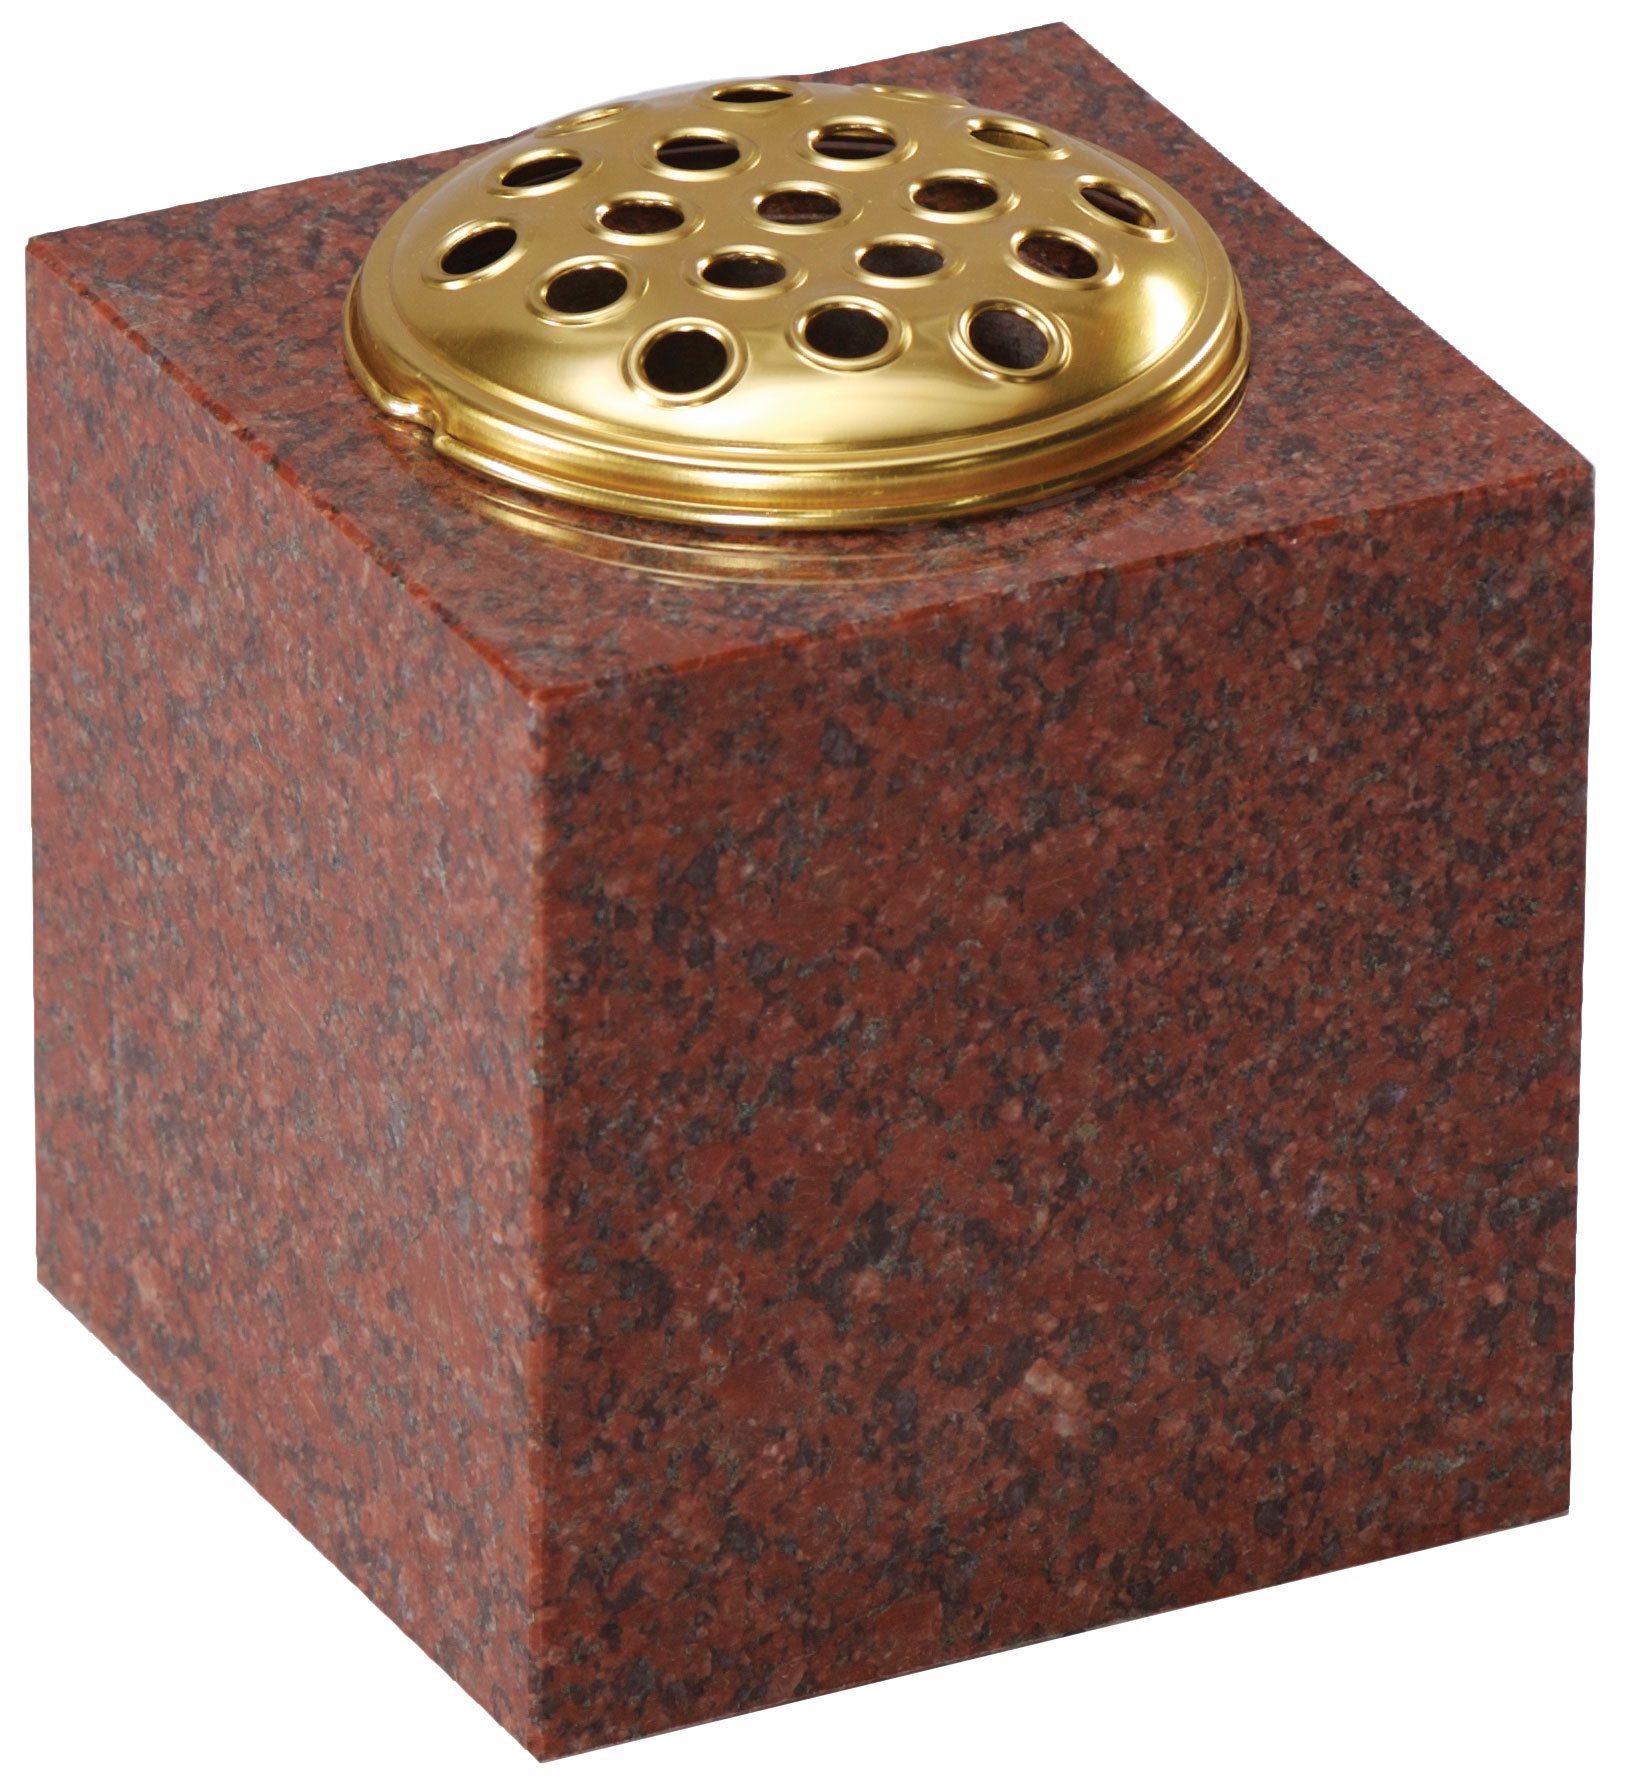 16206 Square vase